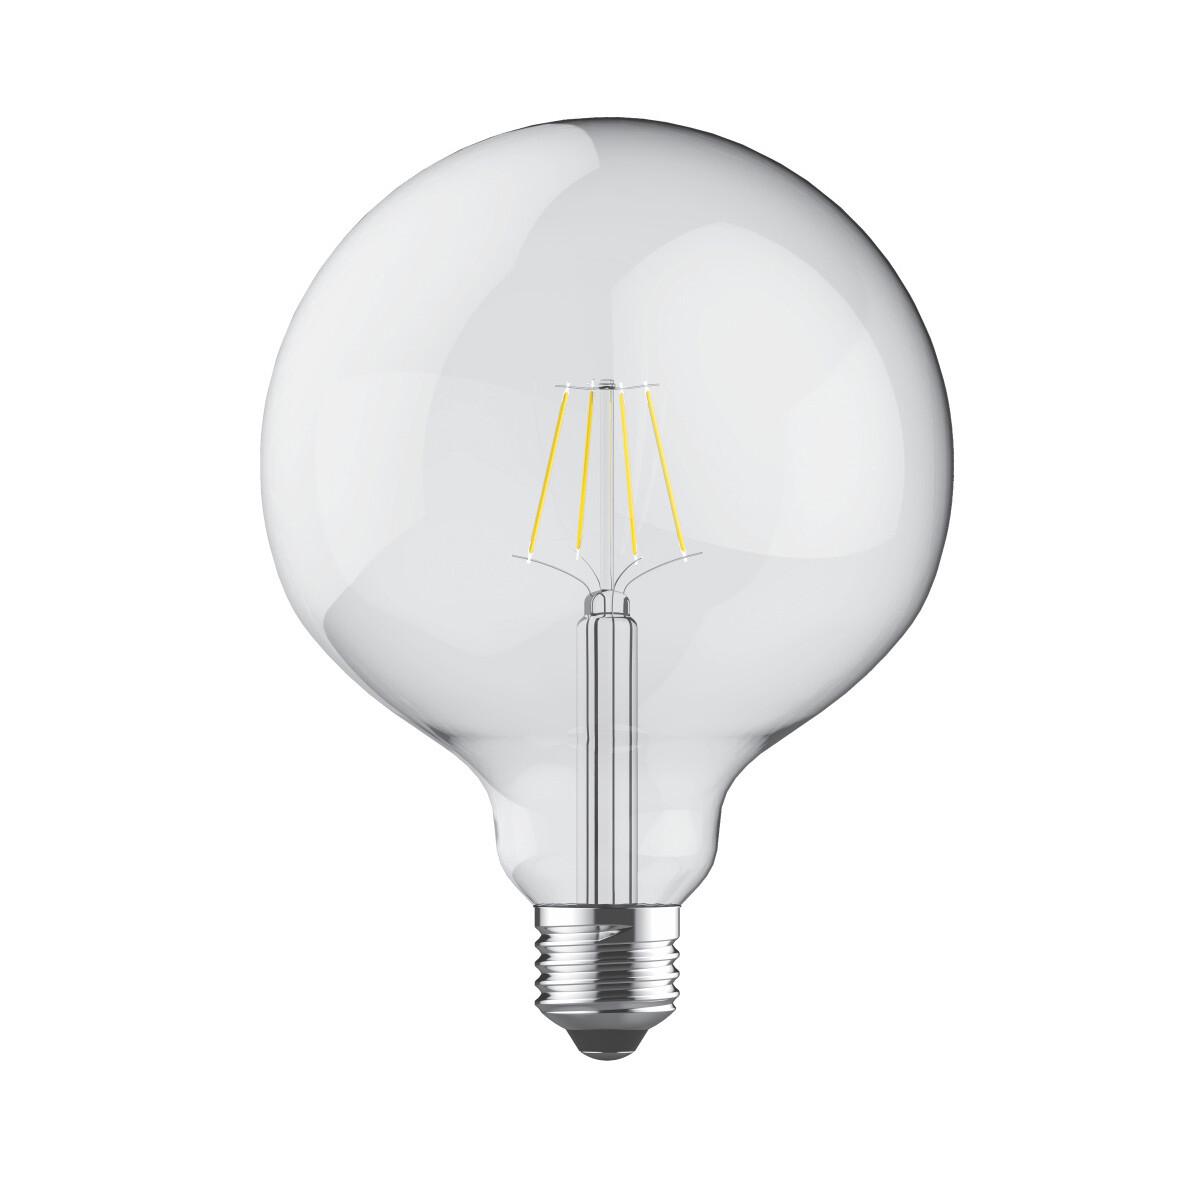 PACK OF 6 E27-LED filament Globe D125 8W 2700K (warm white) 806lm clear